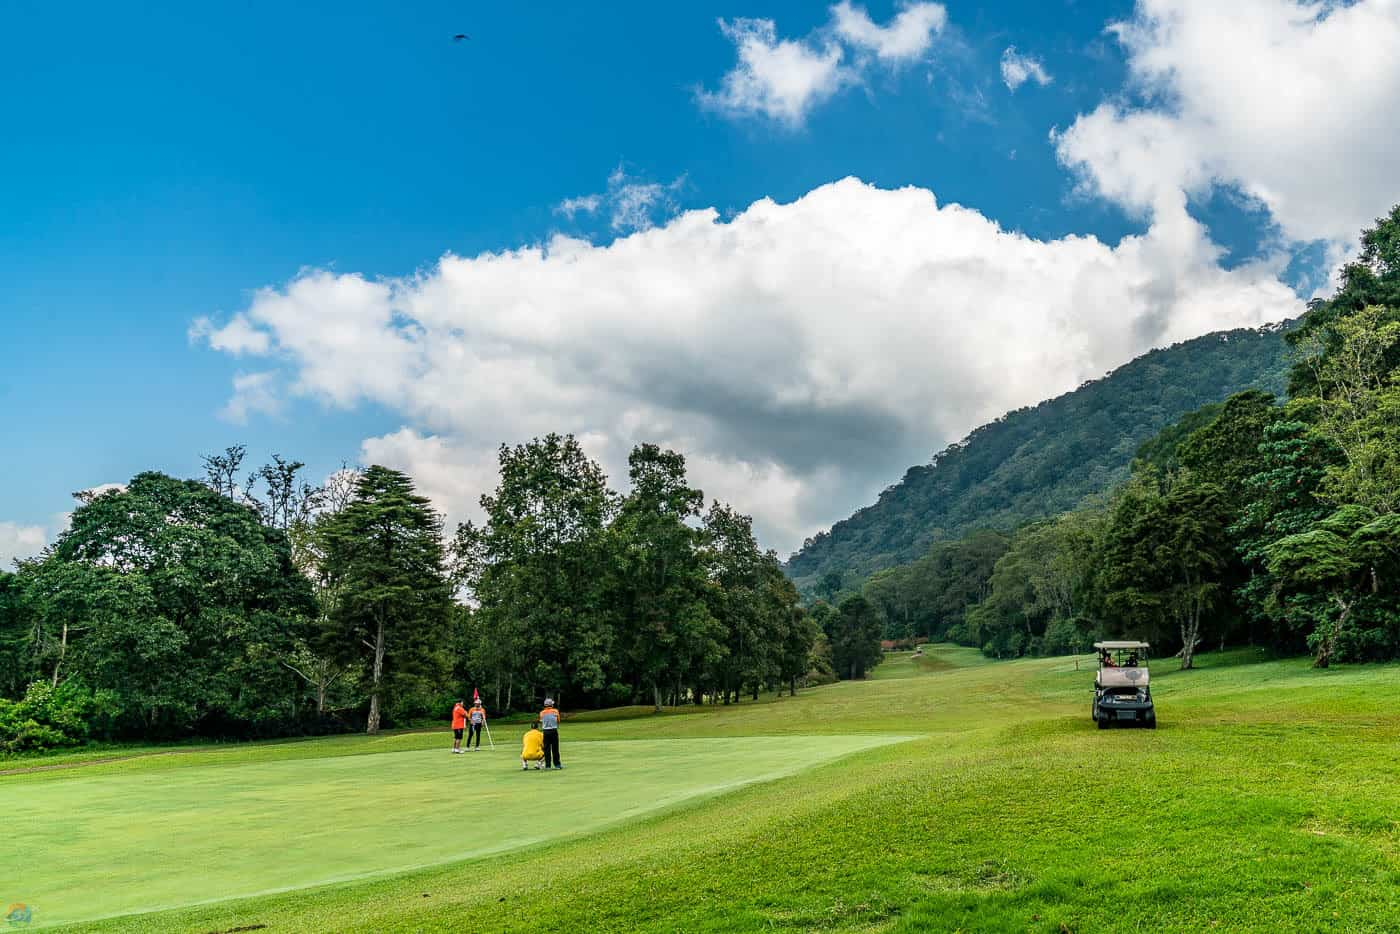 Handara's world class golf course next to the mountains.